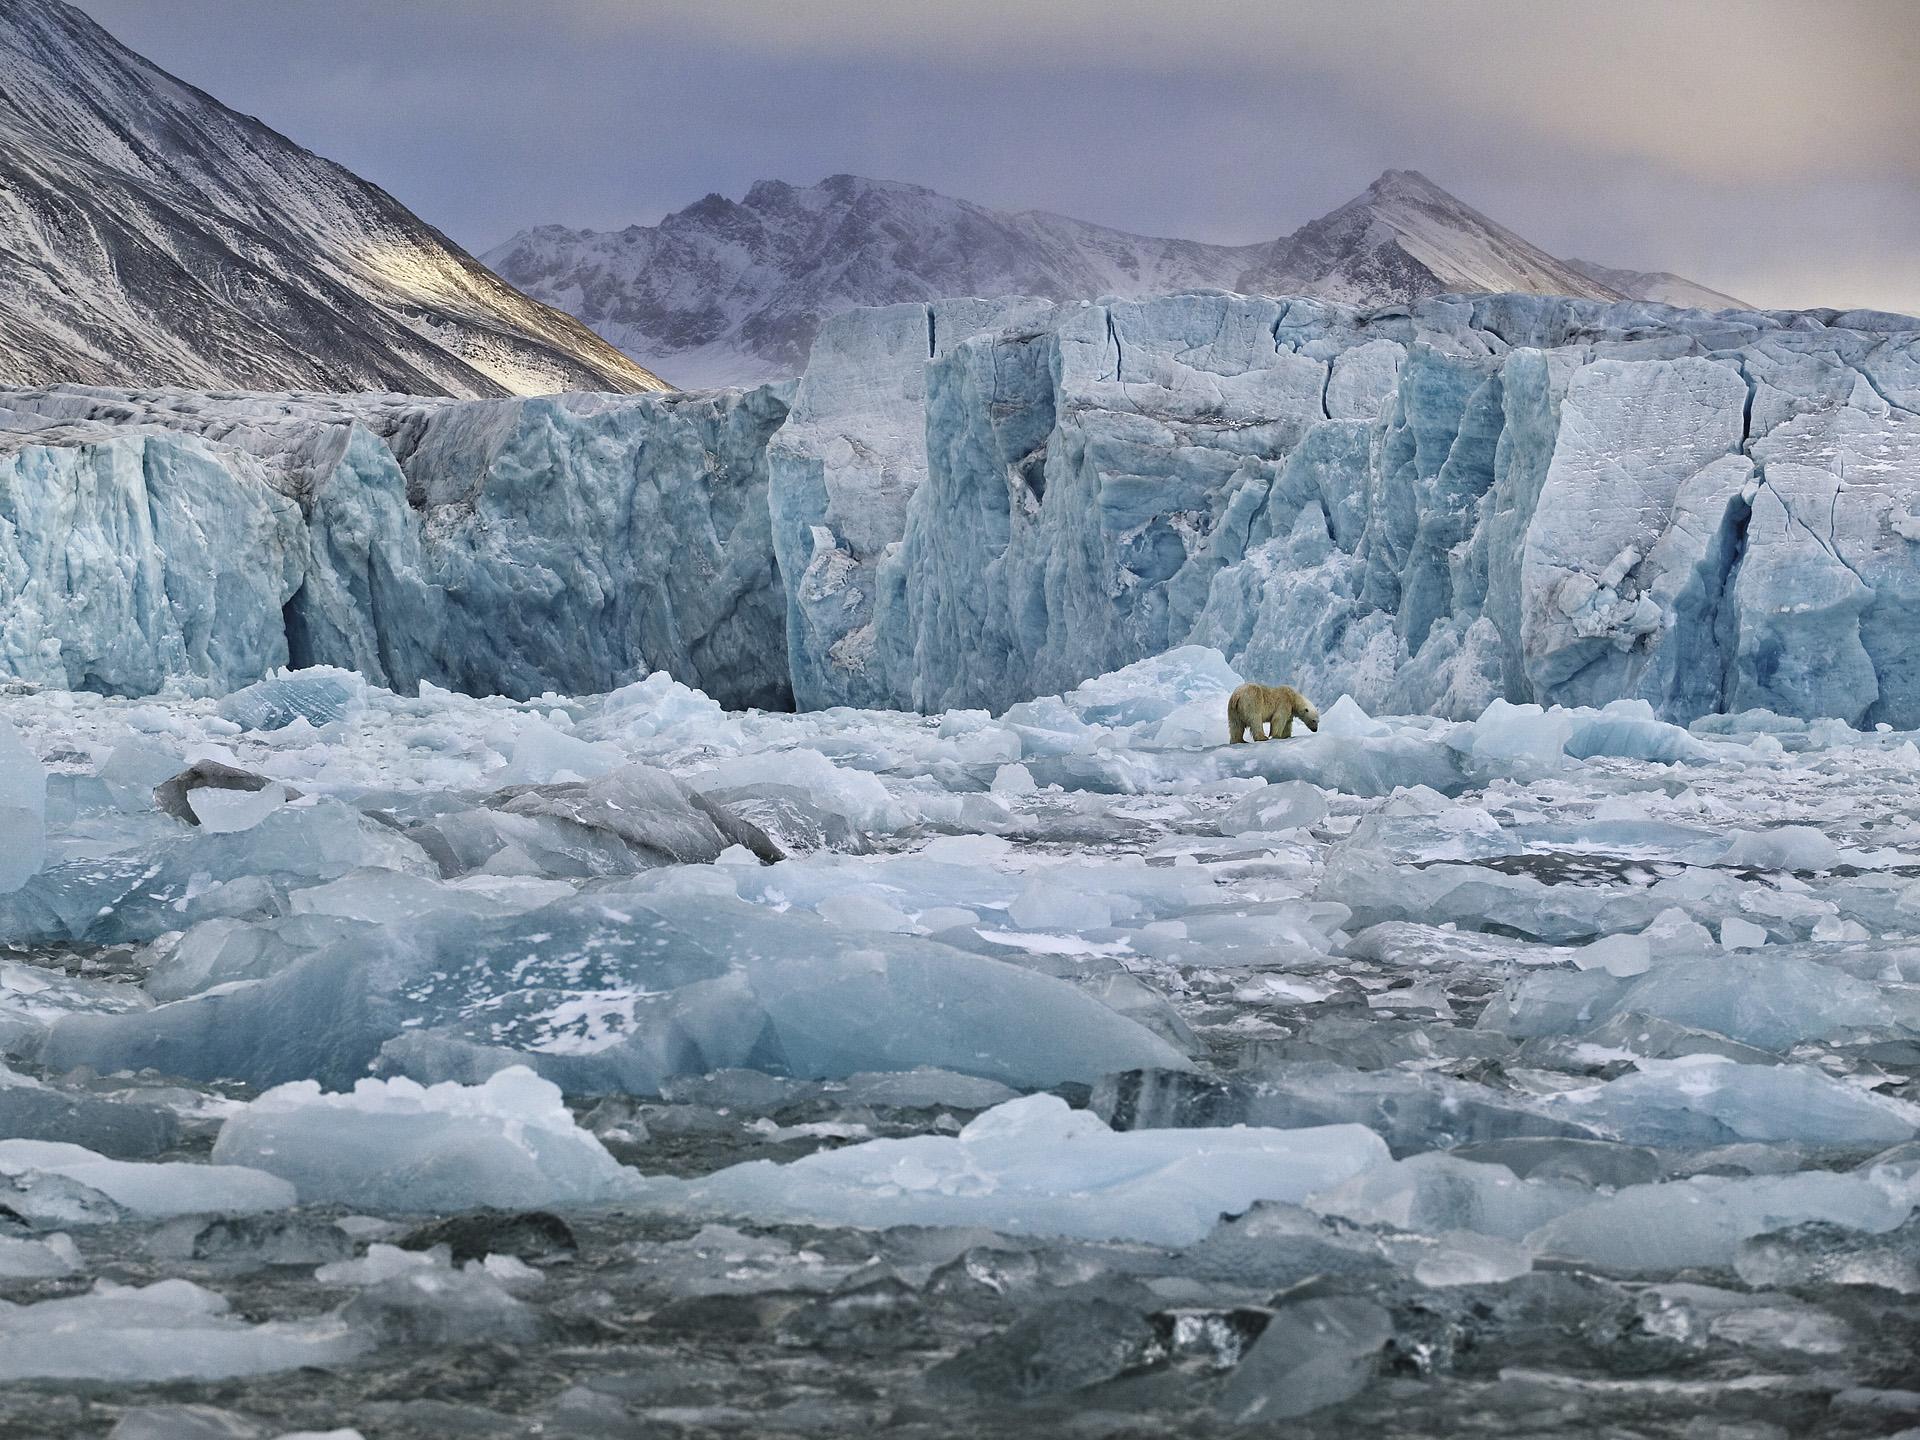 Polar Bear and Monaco Glacier, Svalbard 2004